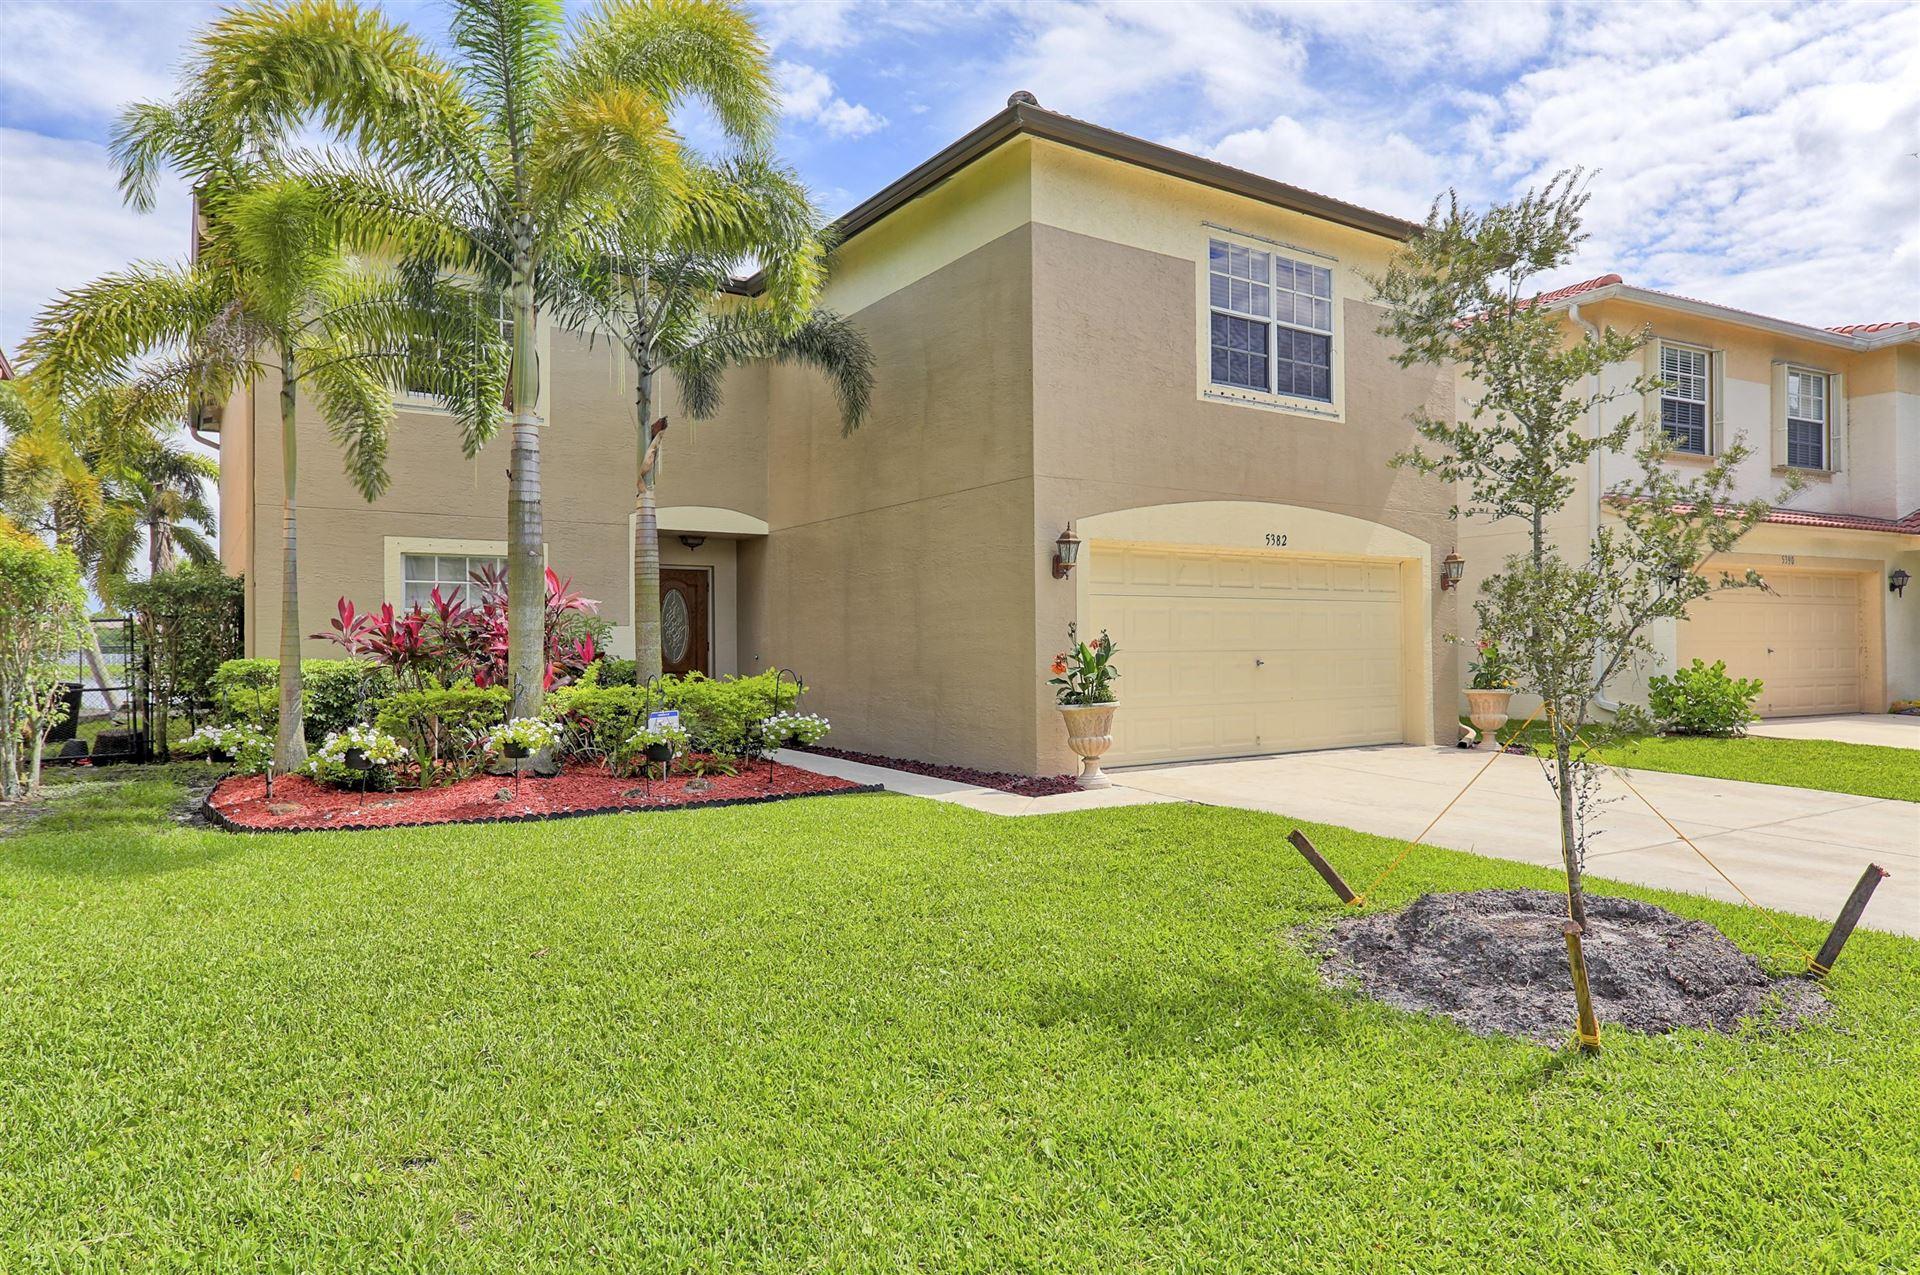 5382 Meadows Edge Drive, Lake Worth, FL 33463 - #: RX-10632476